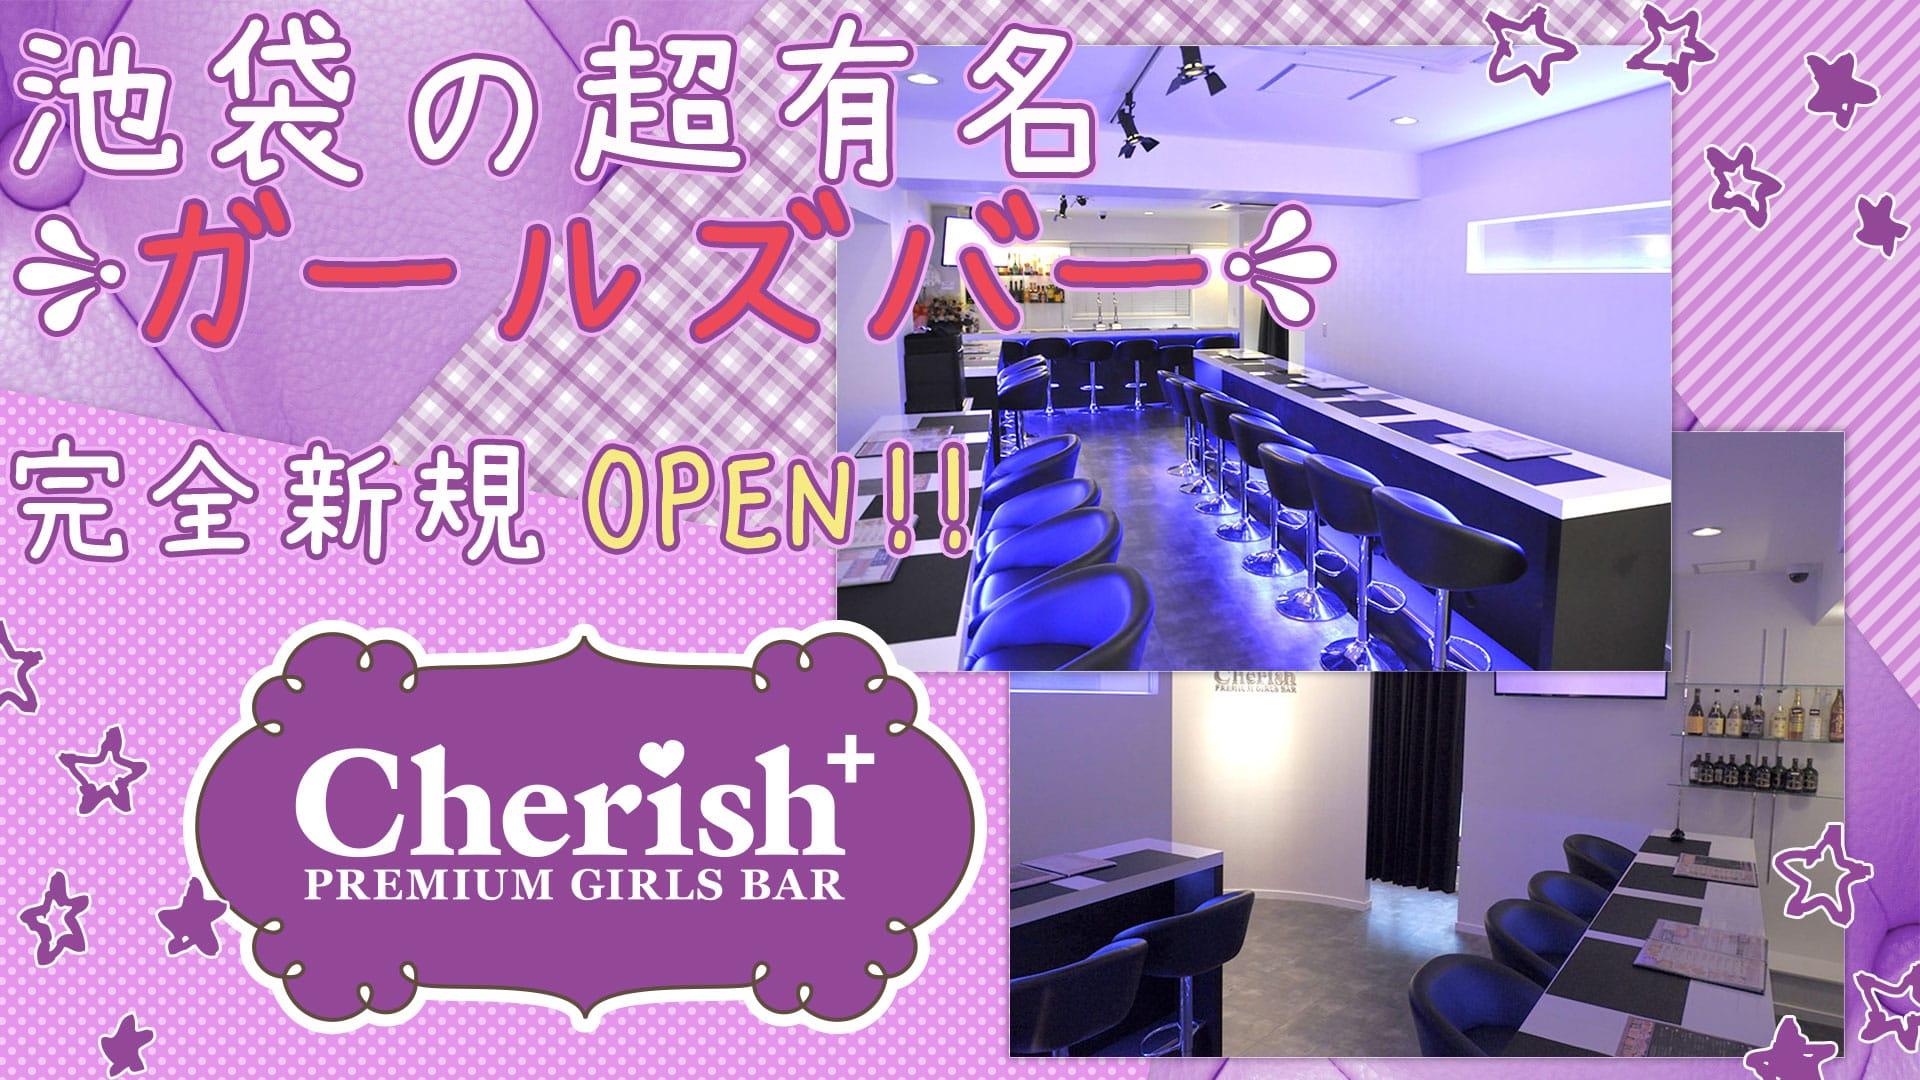 PREMIUM GIRLS BAR Cherish+<チェリッシュ3号店> 池袋 ガールズバー TOP画像